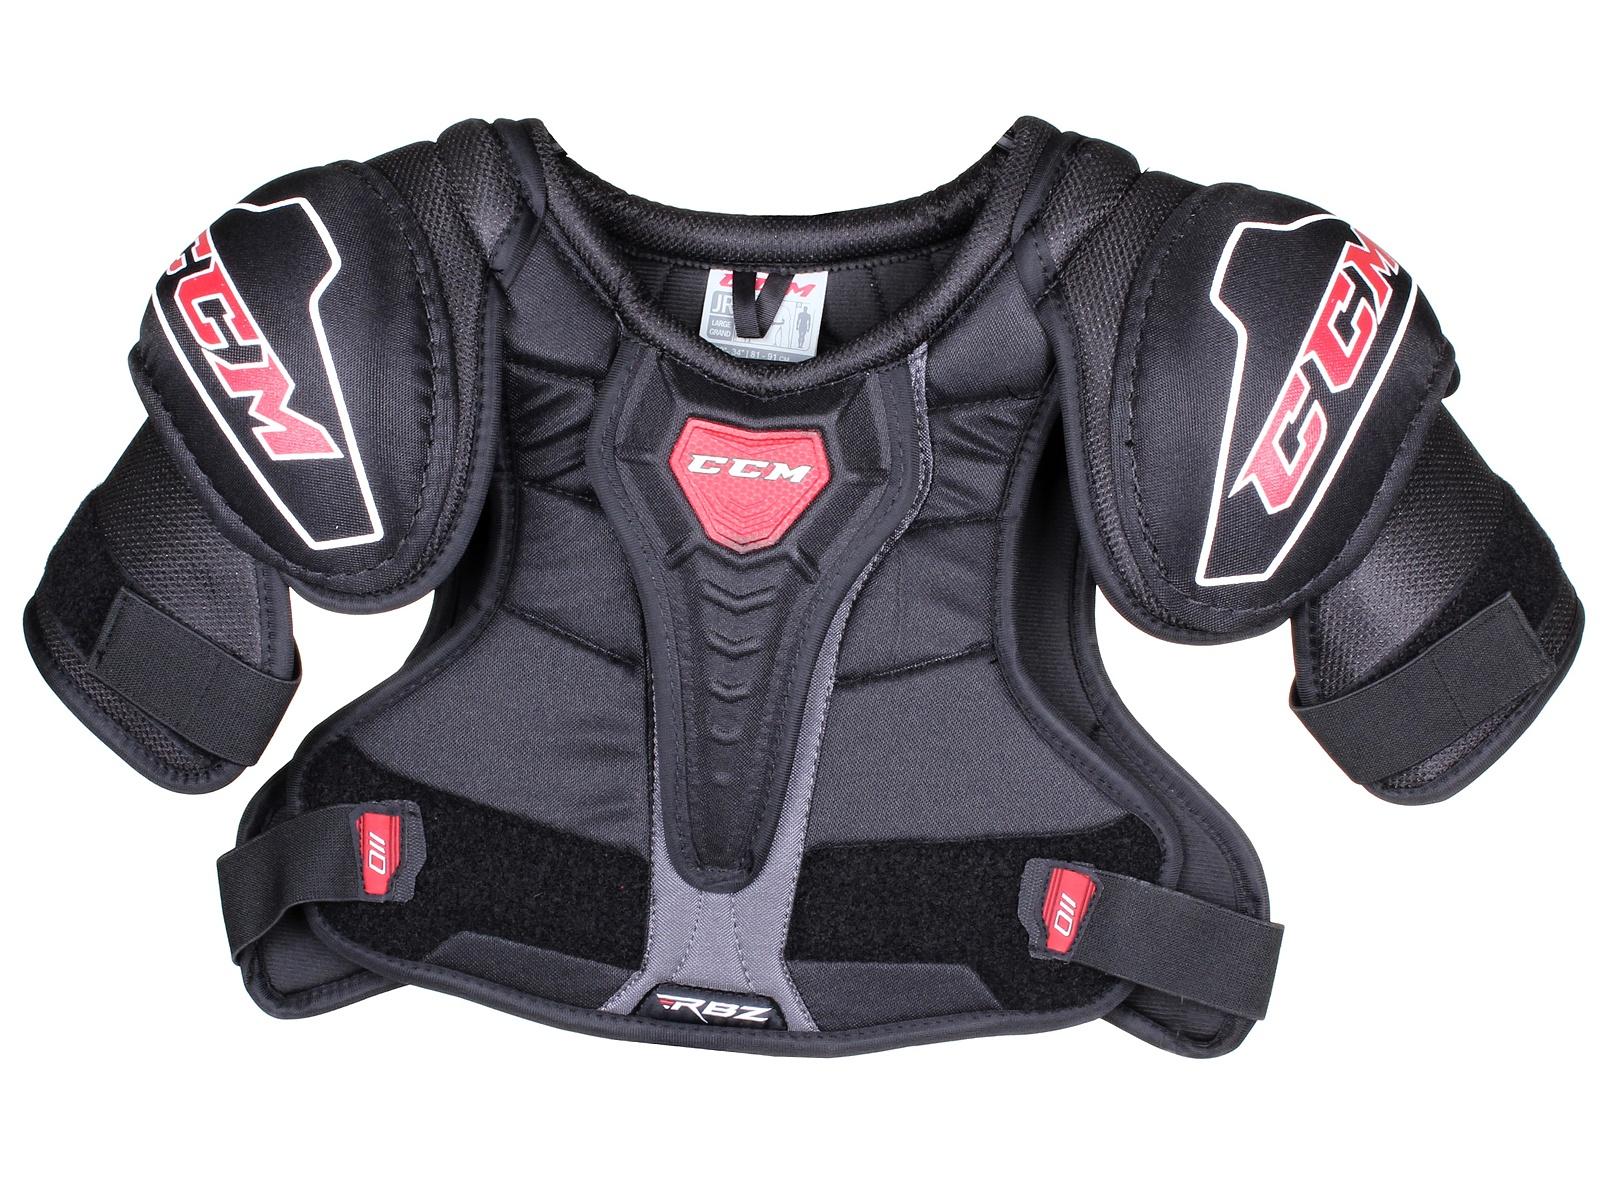 Hokejový chránič ramen CCM RBZ 110 JR - vel. L